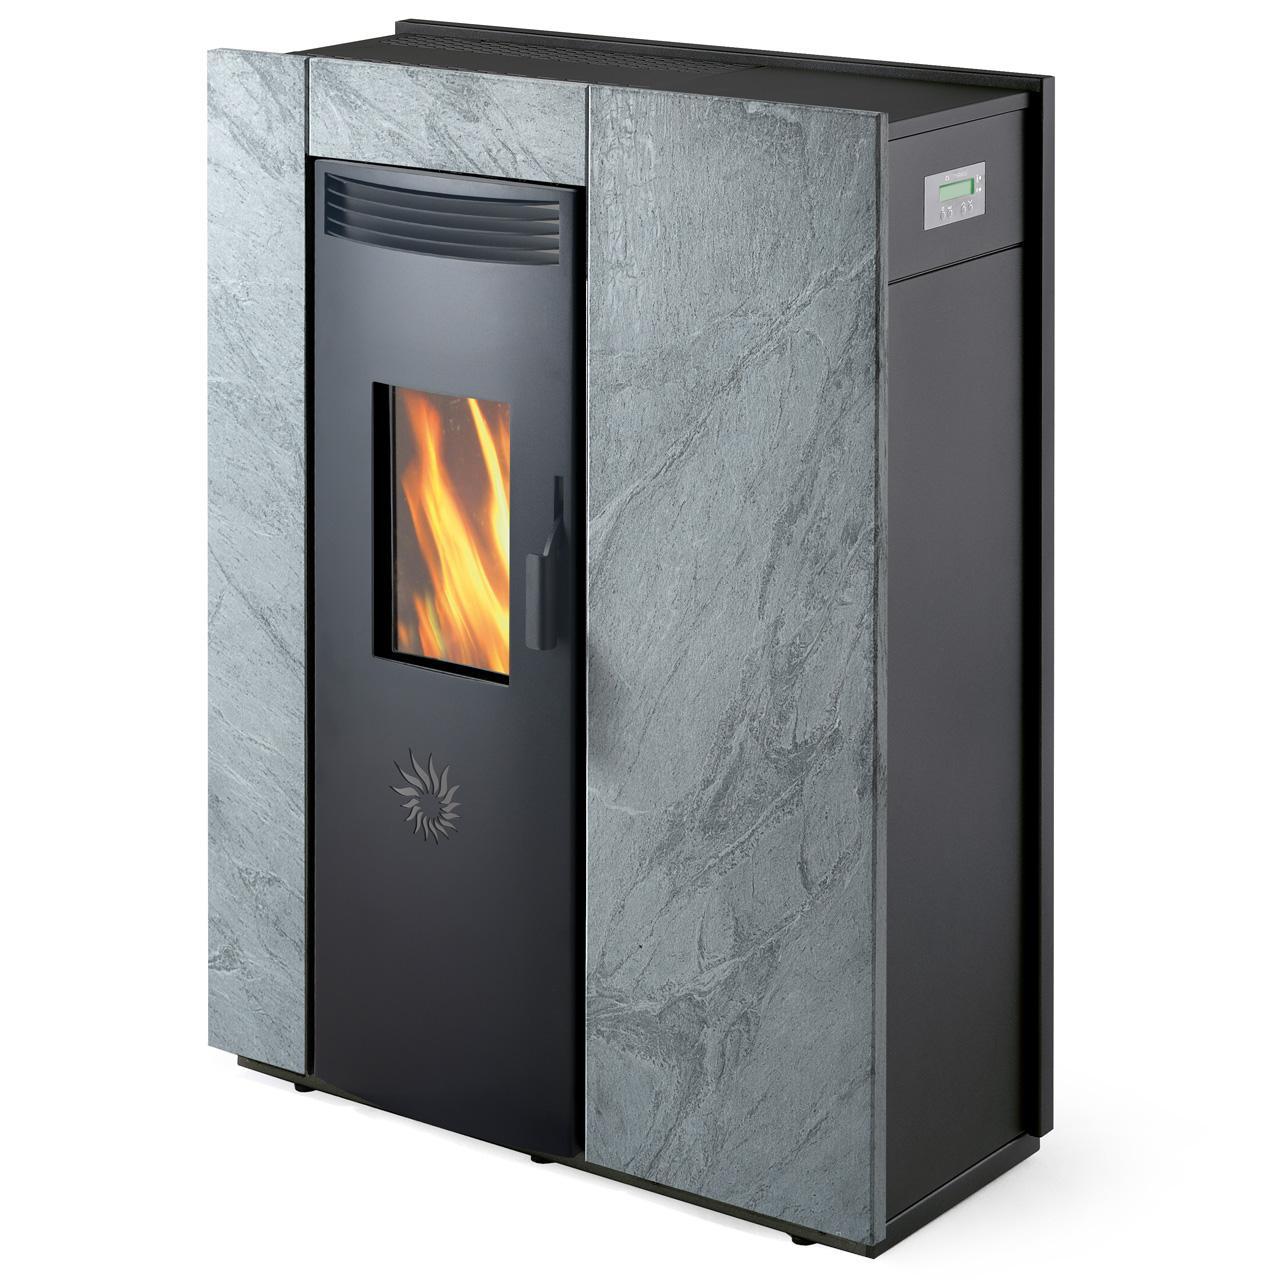 tesi stufa pellet pellet biomassa cs thermos. Black Bedroom Furniture Sets. Home Design Ideas